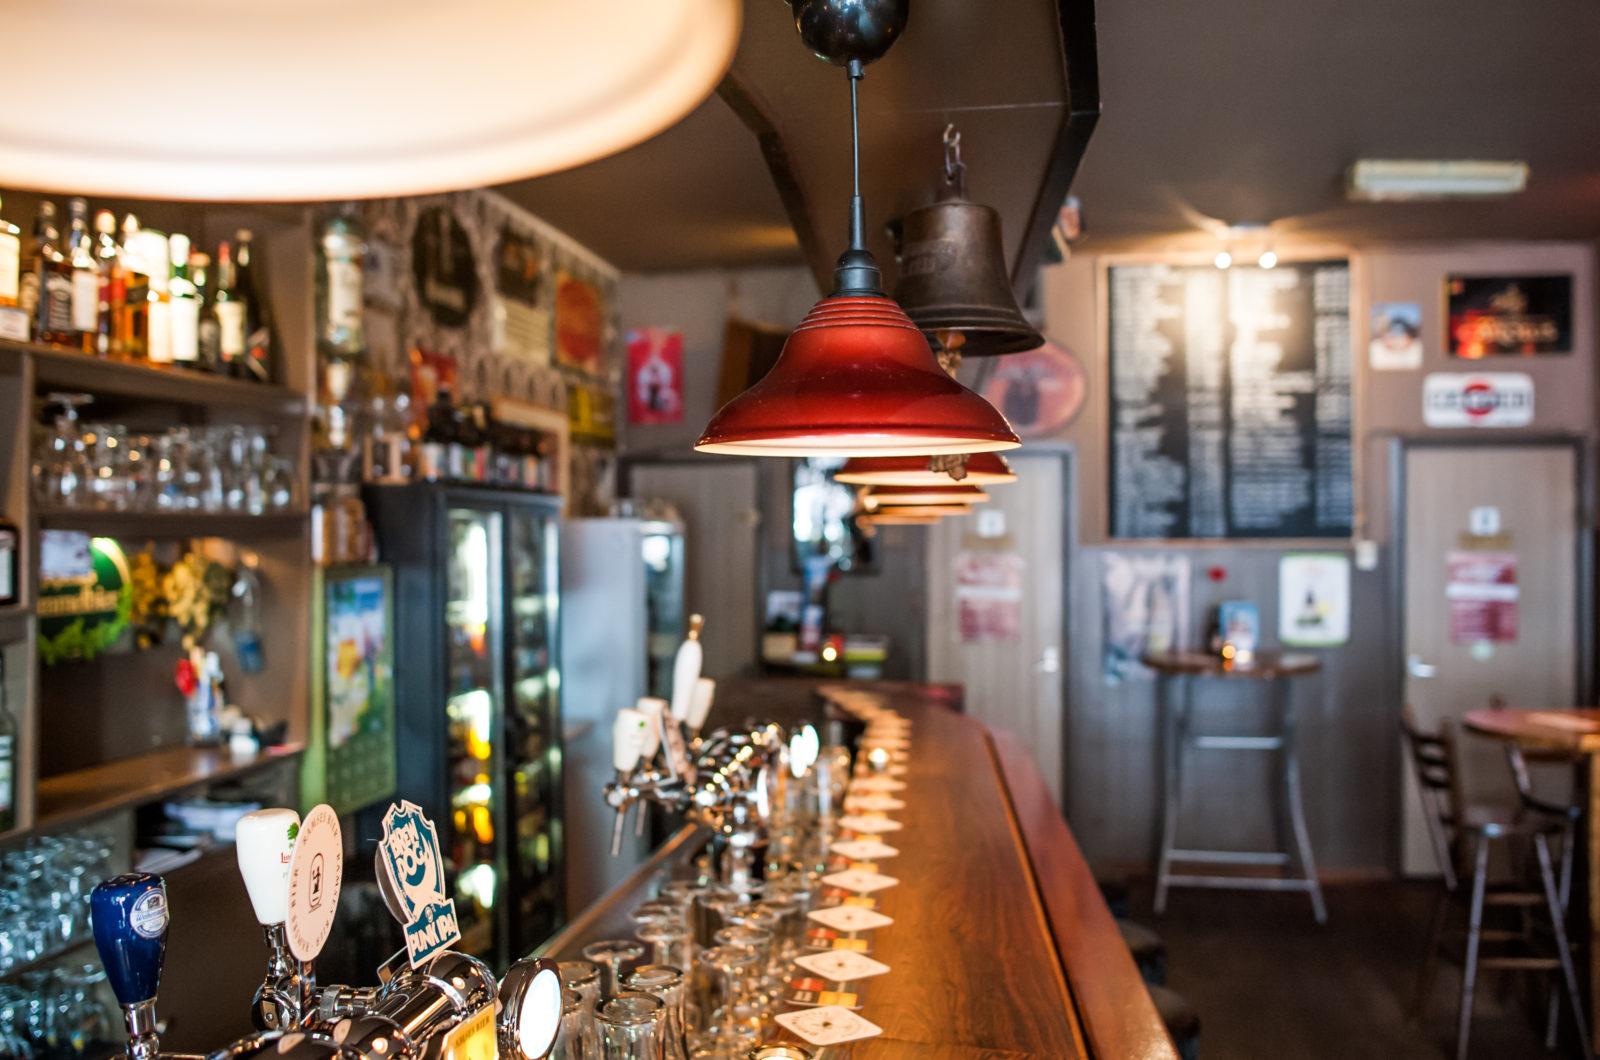 d9c72c79b1f Café de Koffer - Discover Groningen